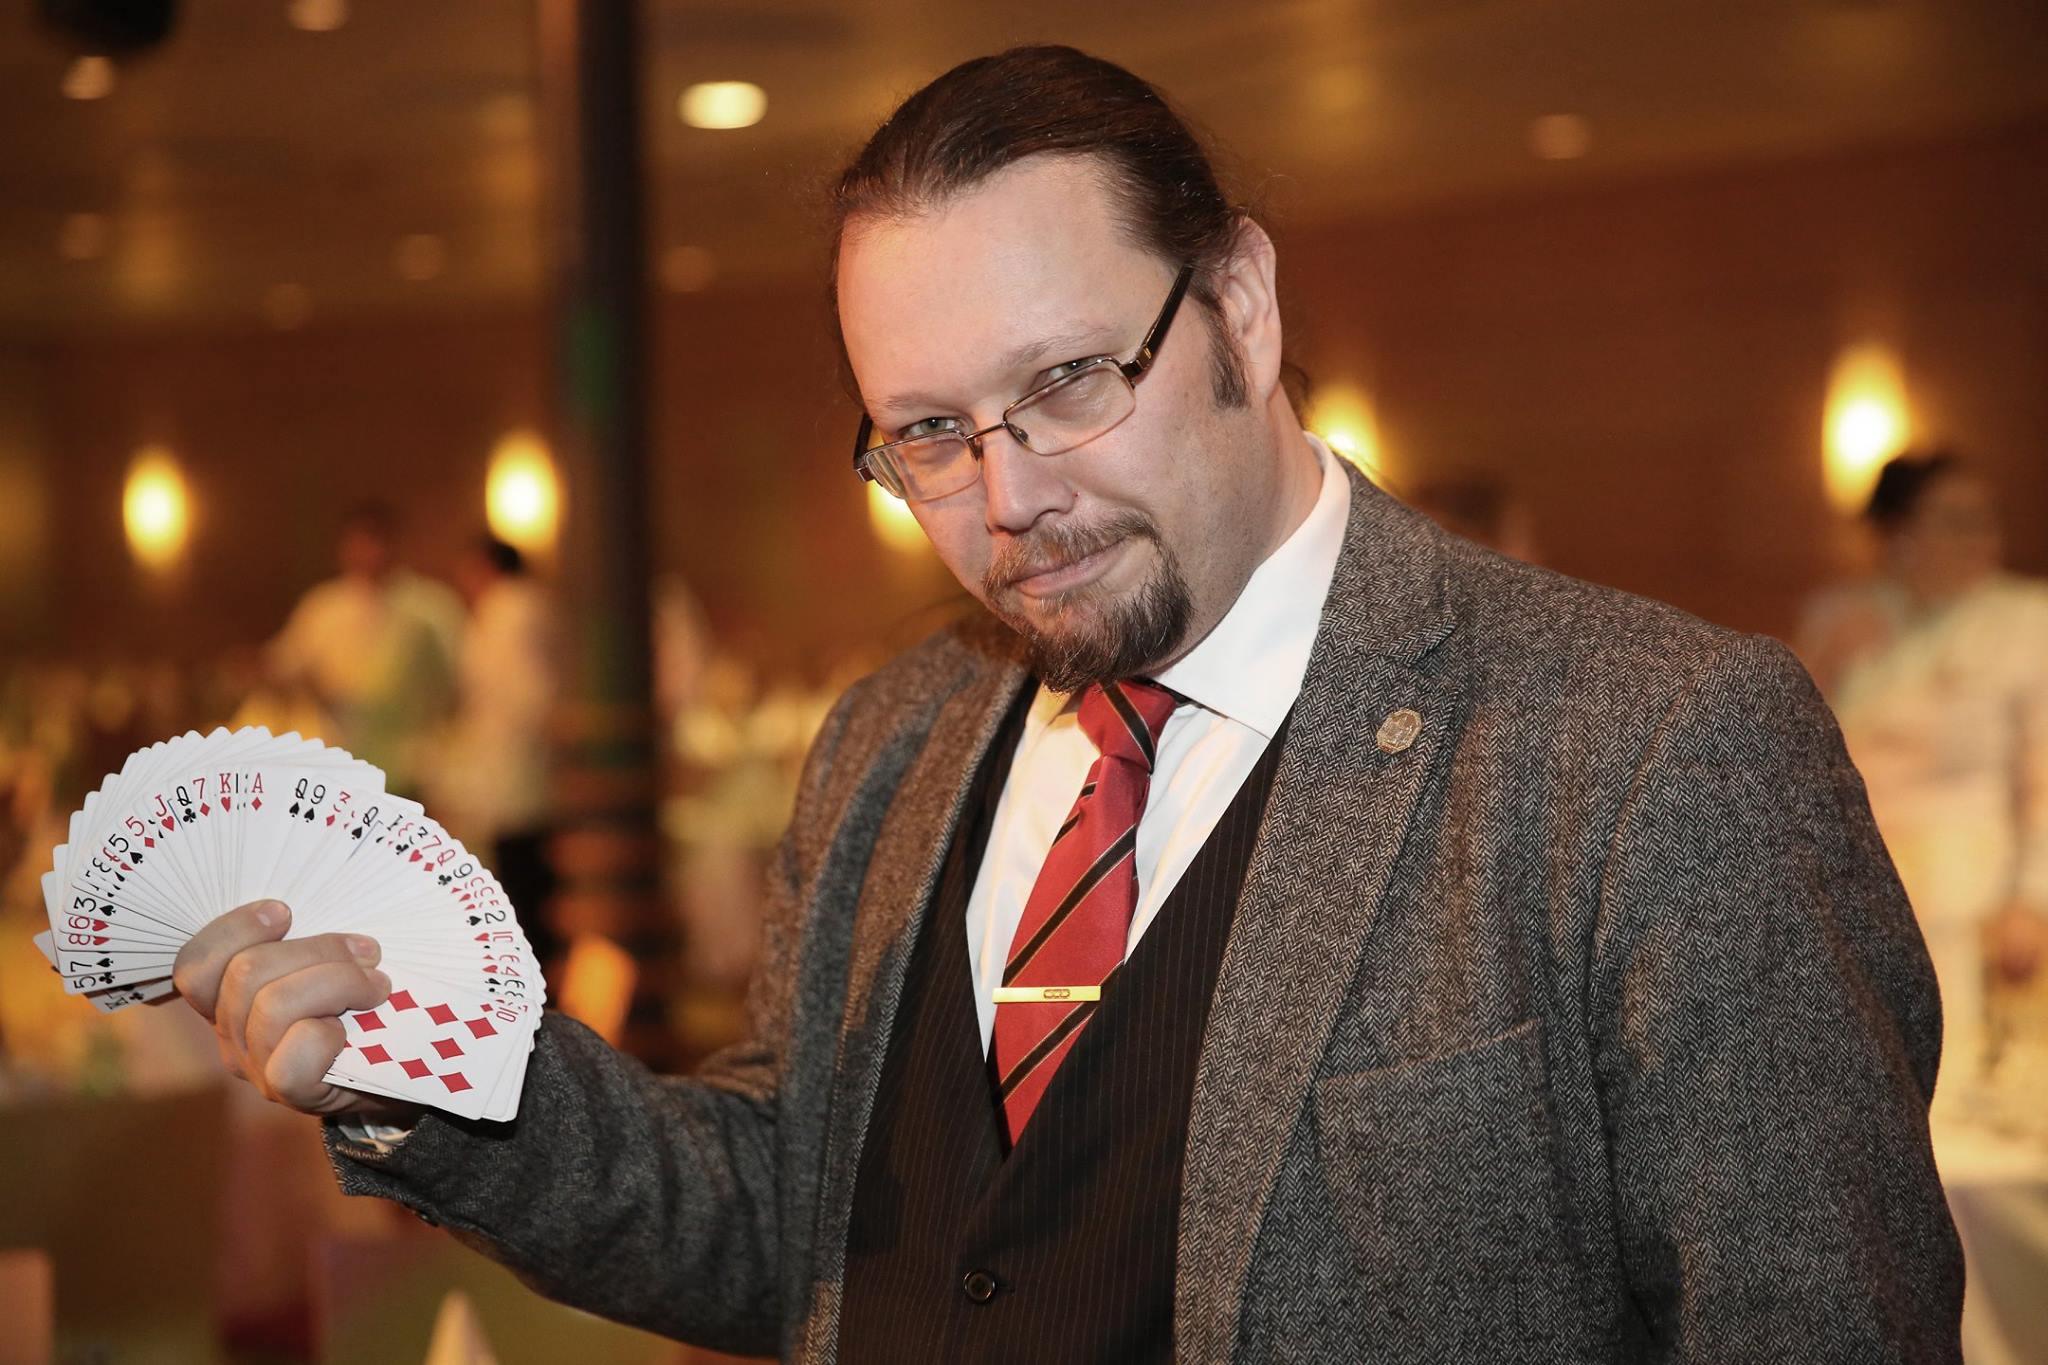 Foto: Erik Sjöstedt